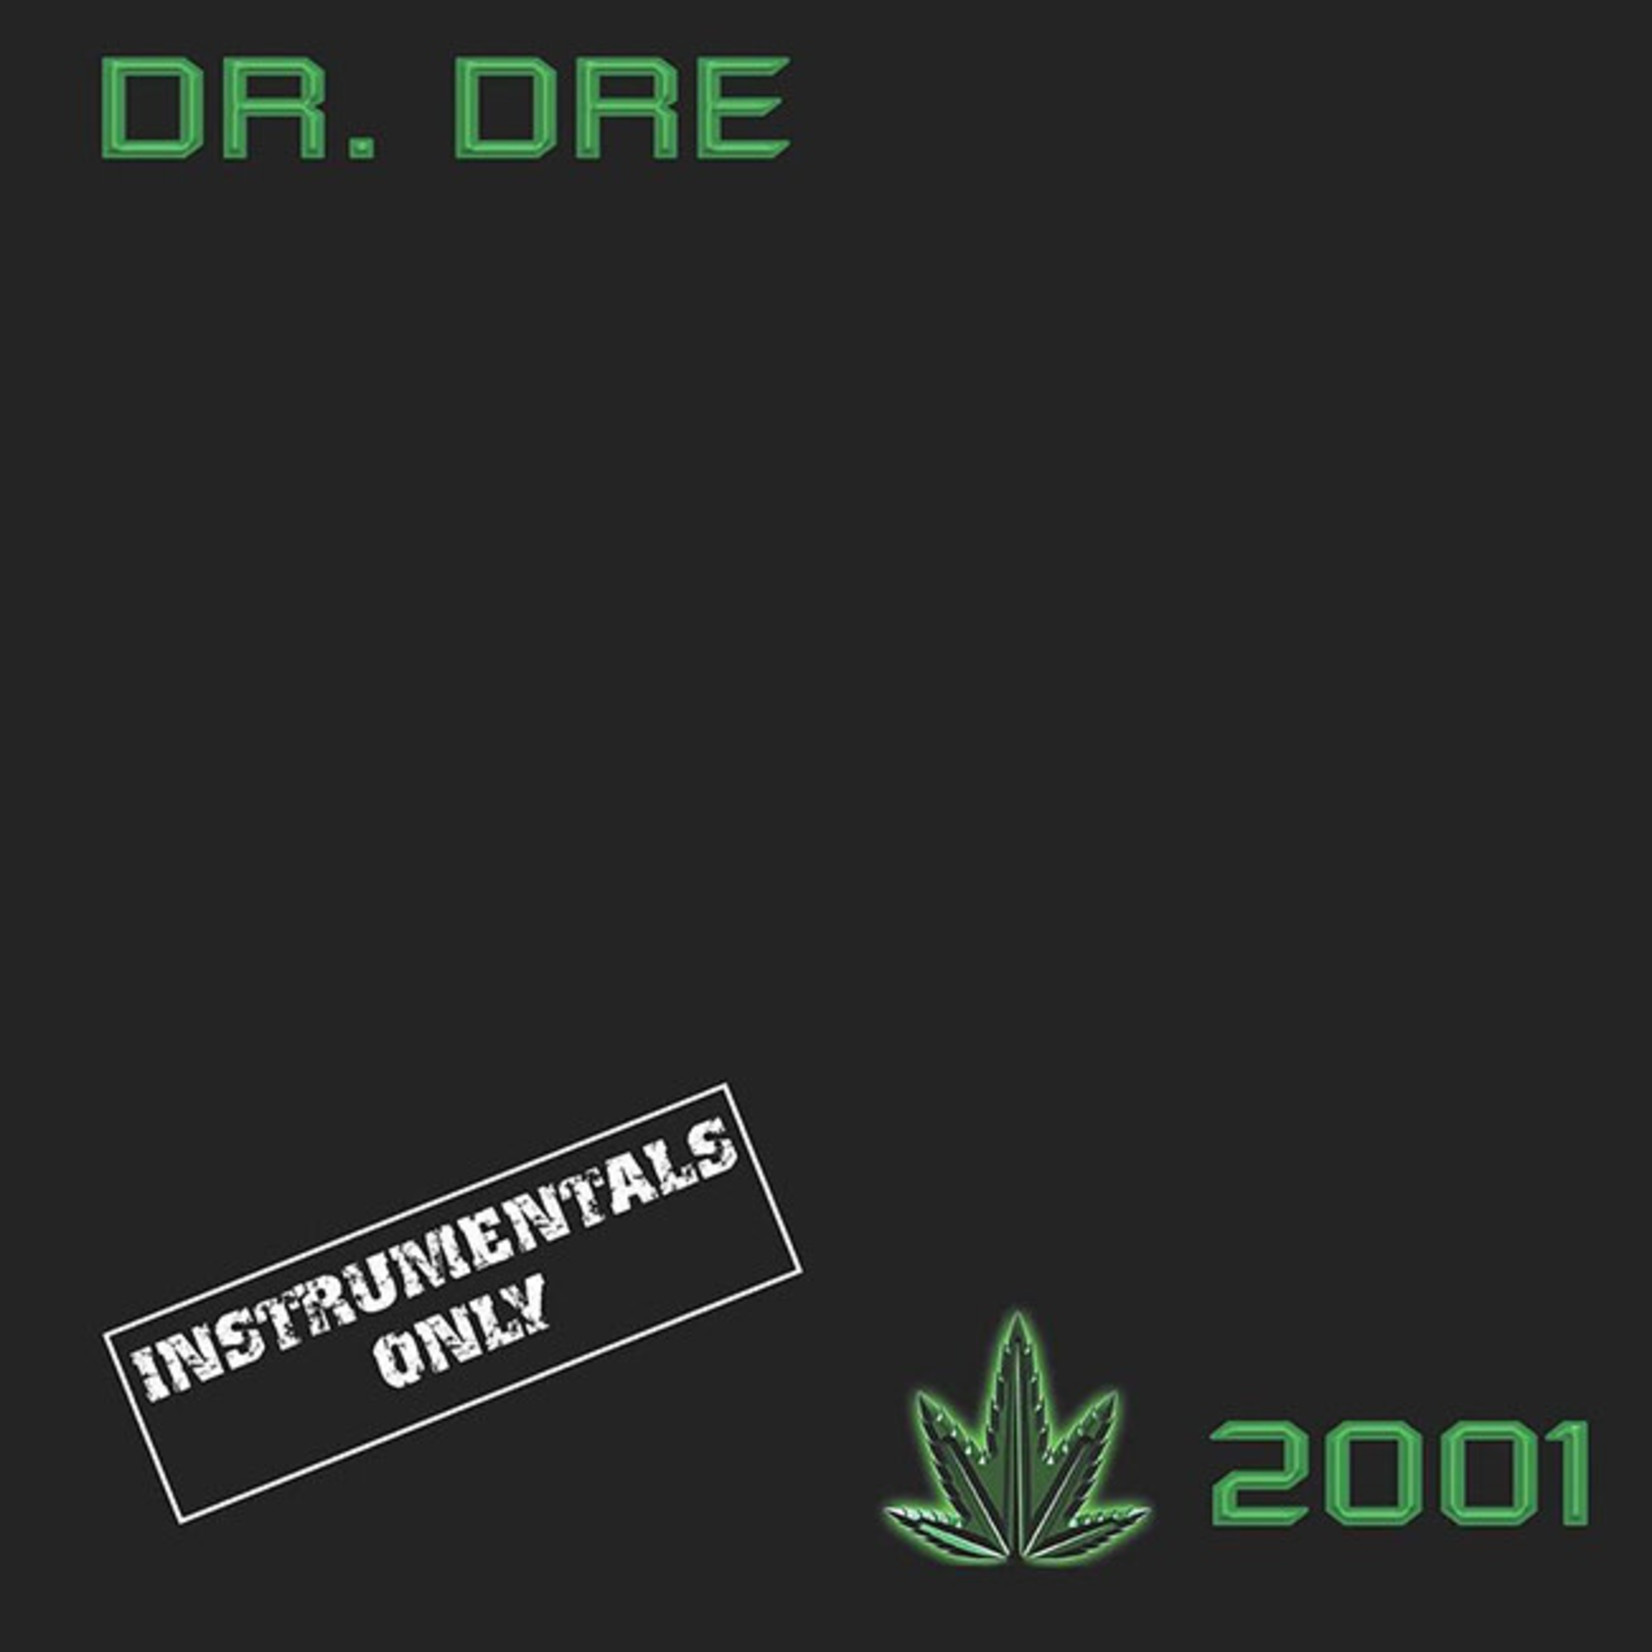 [New] Dr. Dre: 2001 (2LP, instrumentals only)